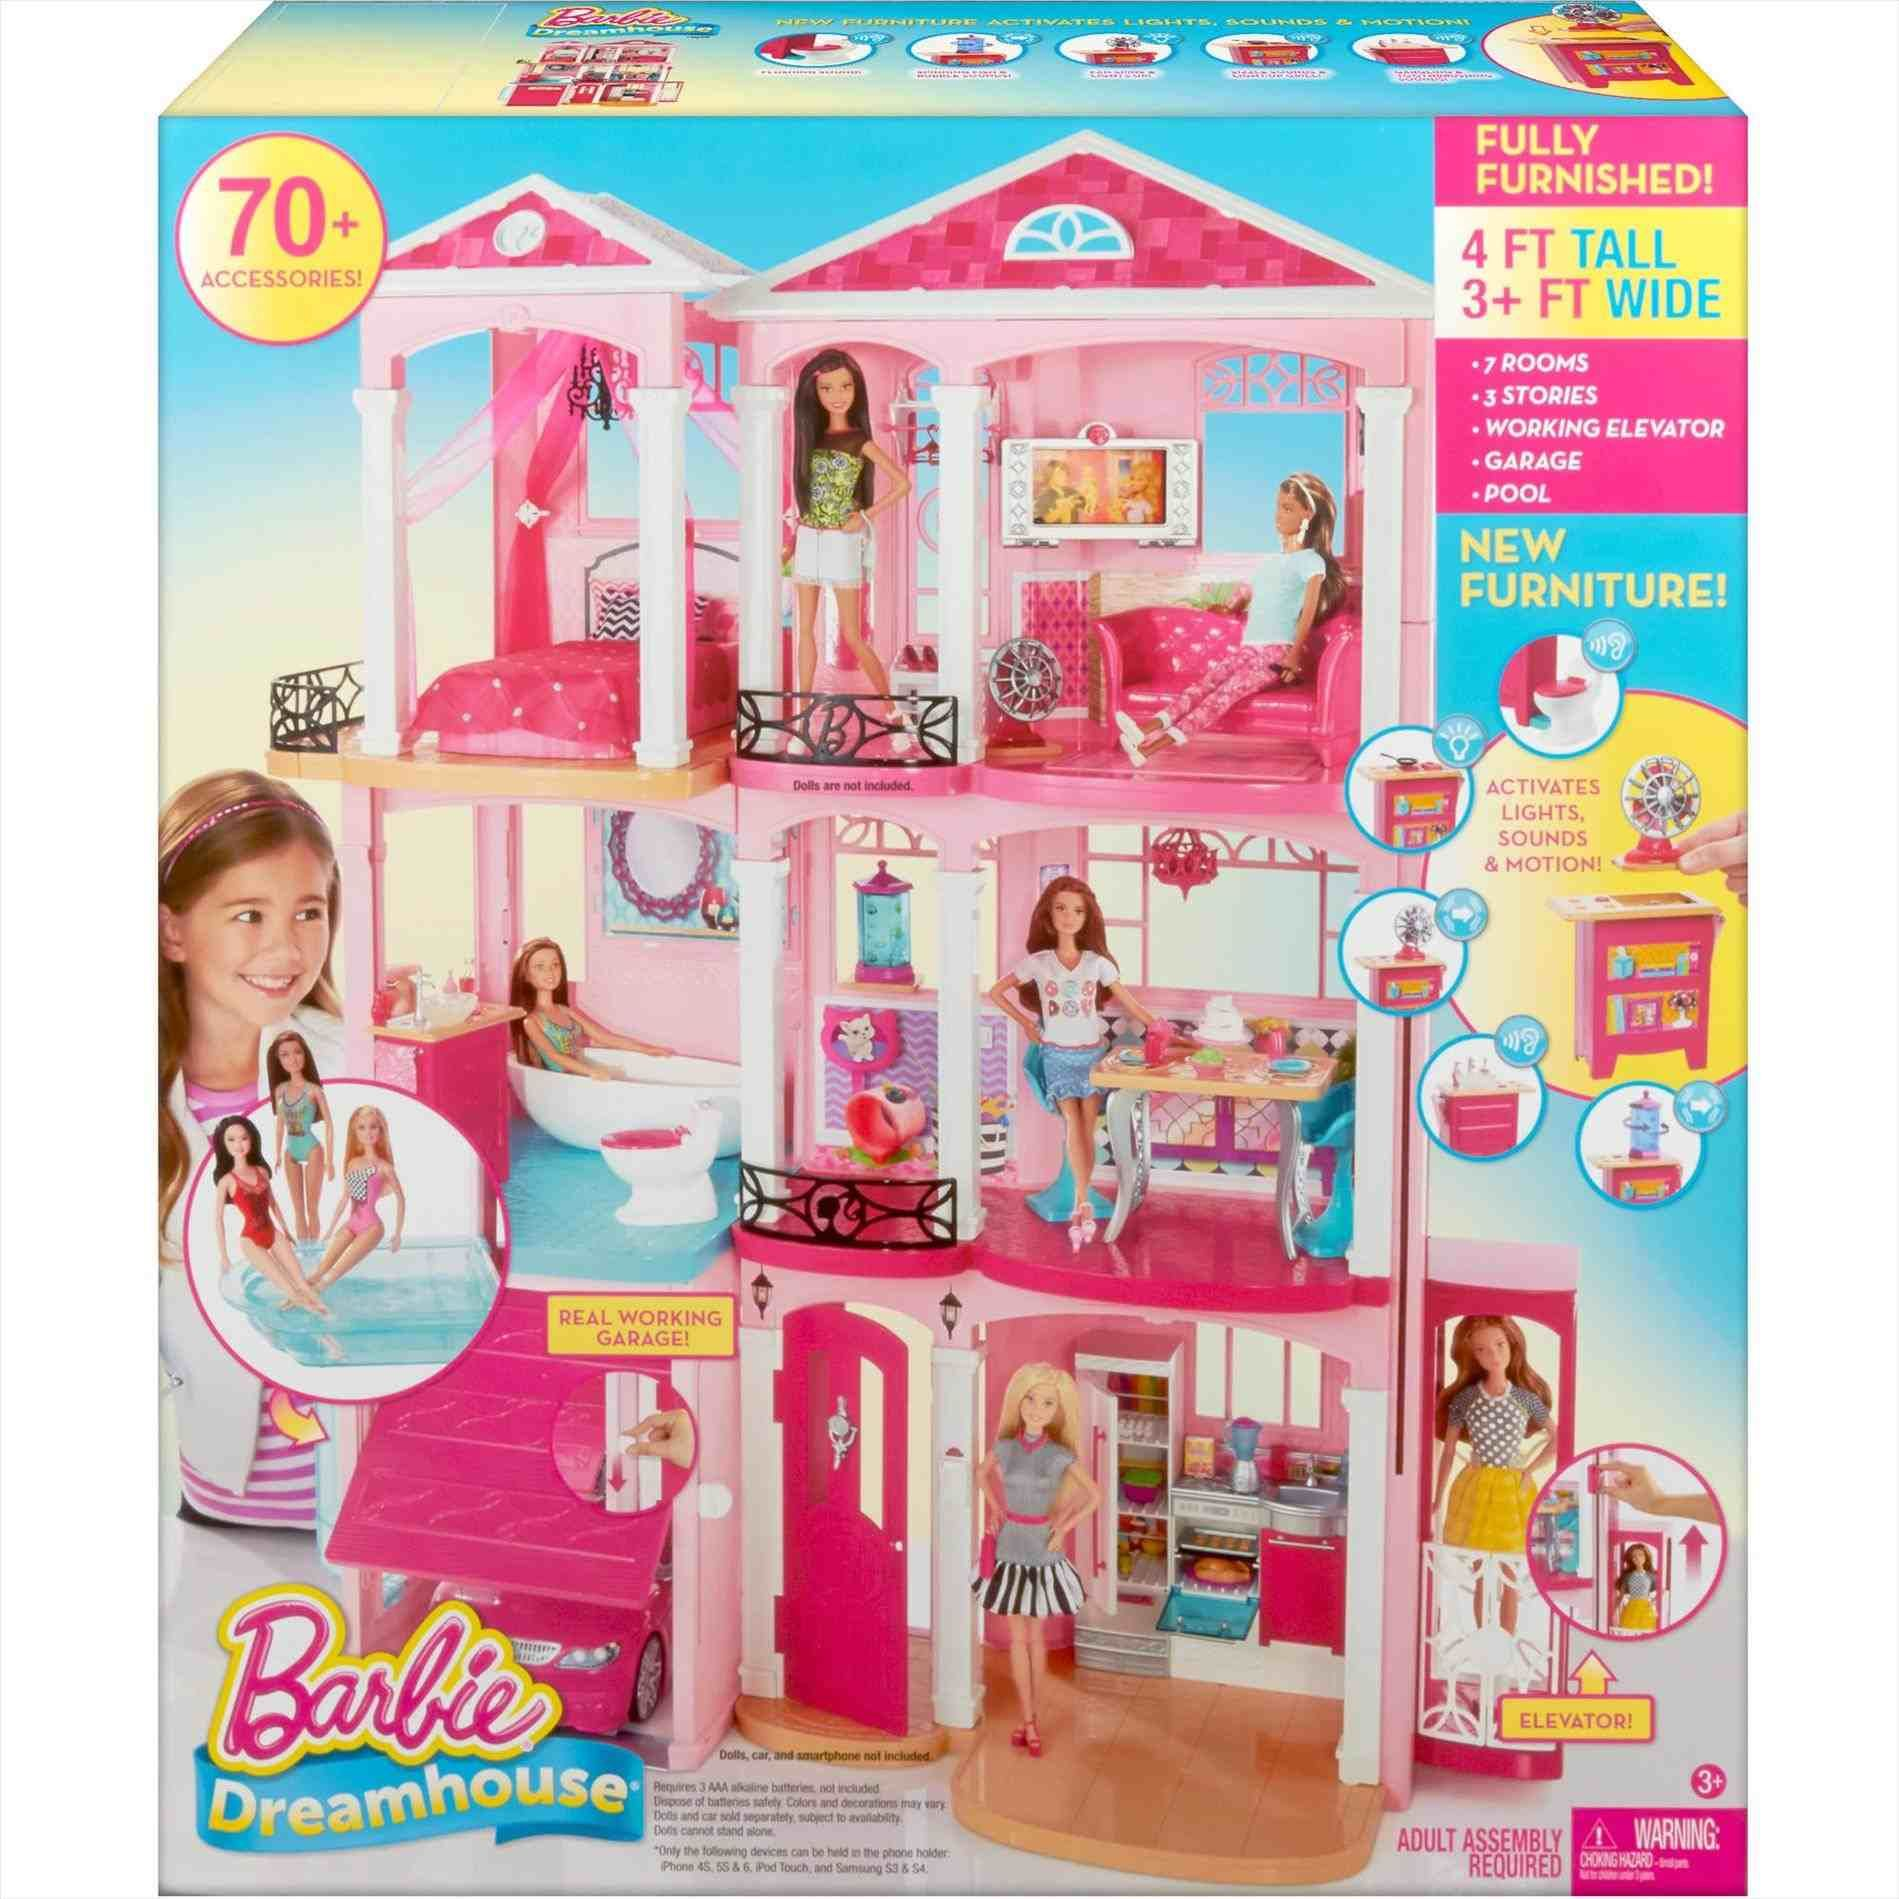 New Post Barbie Doll Dream House 2016 Visit Bobayule Trending Decors